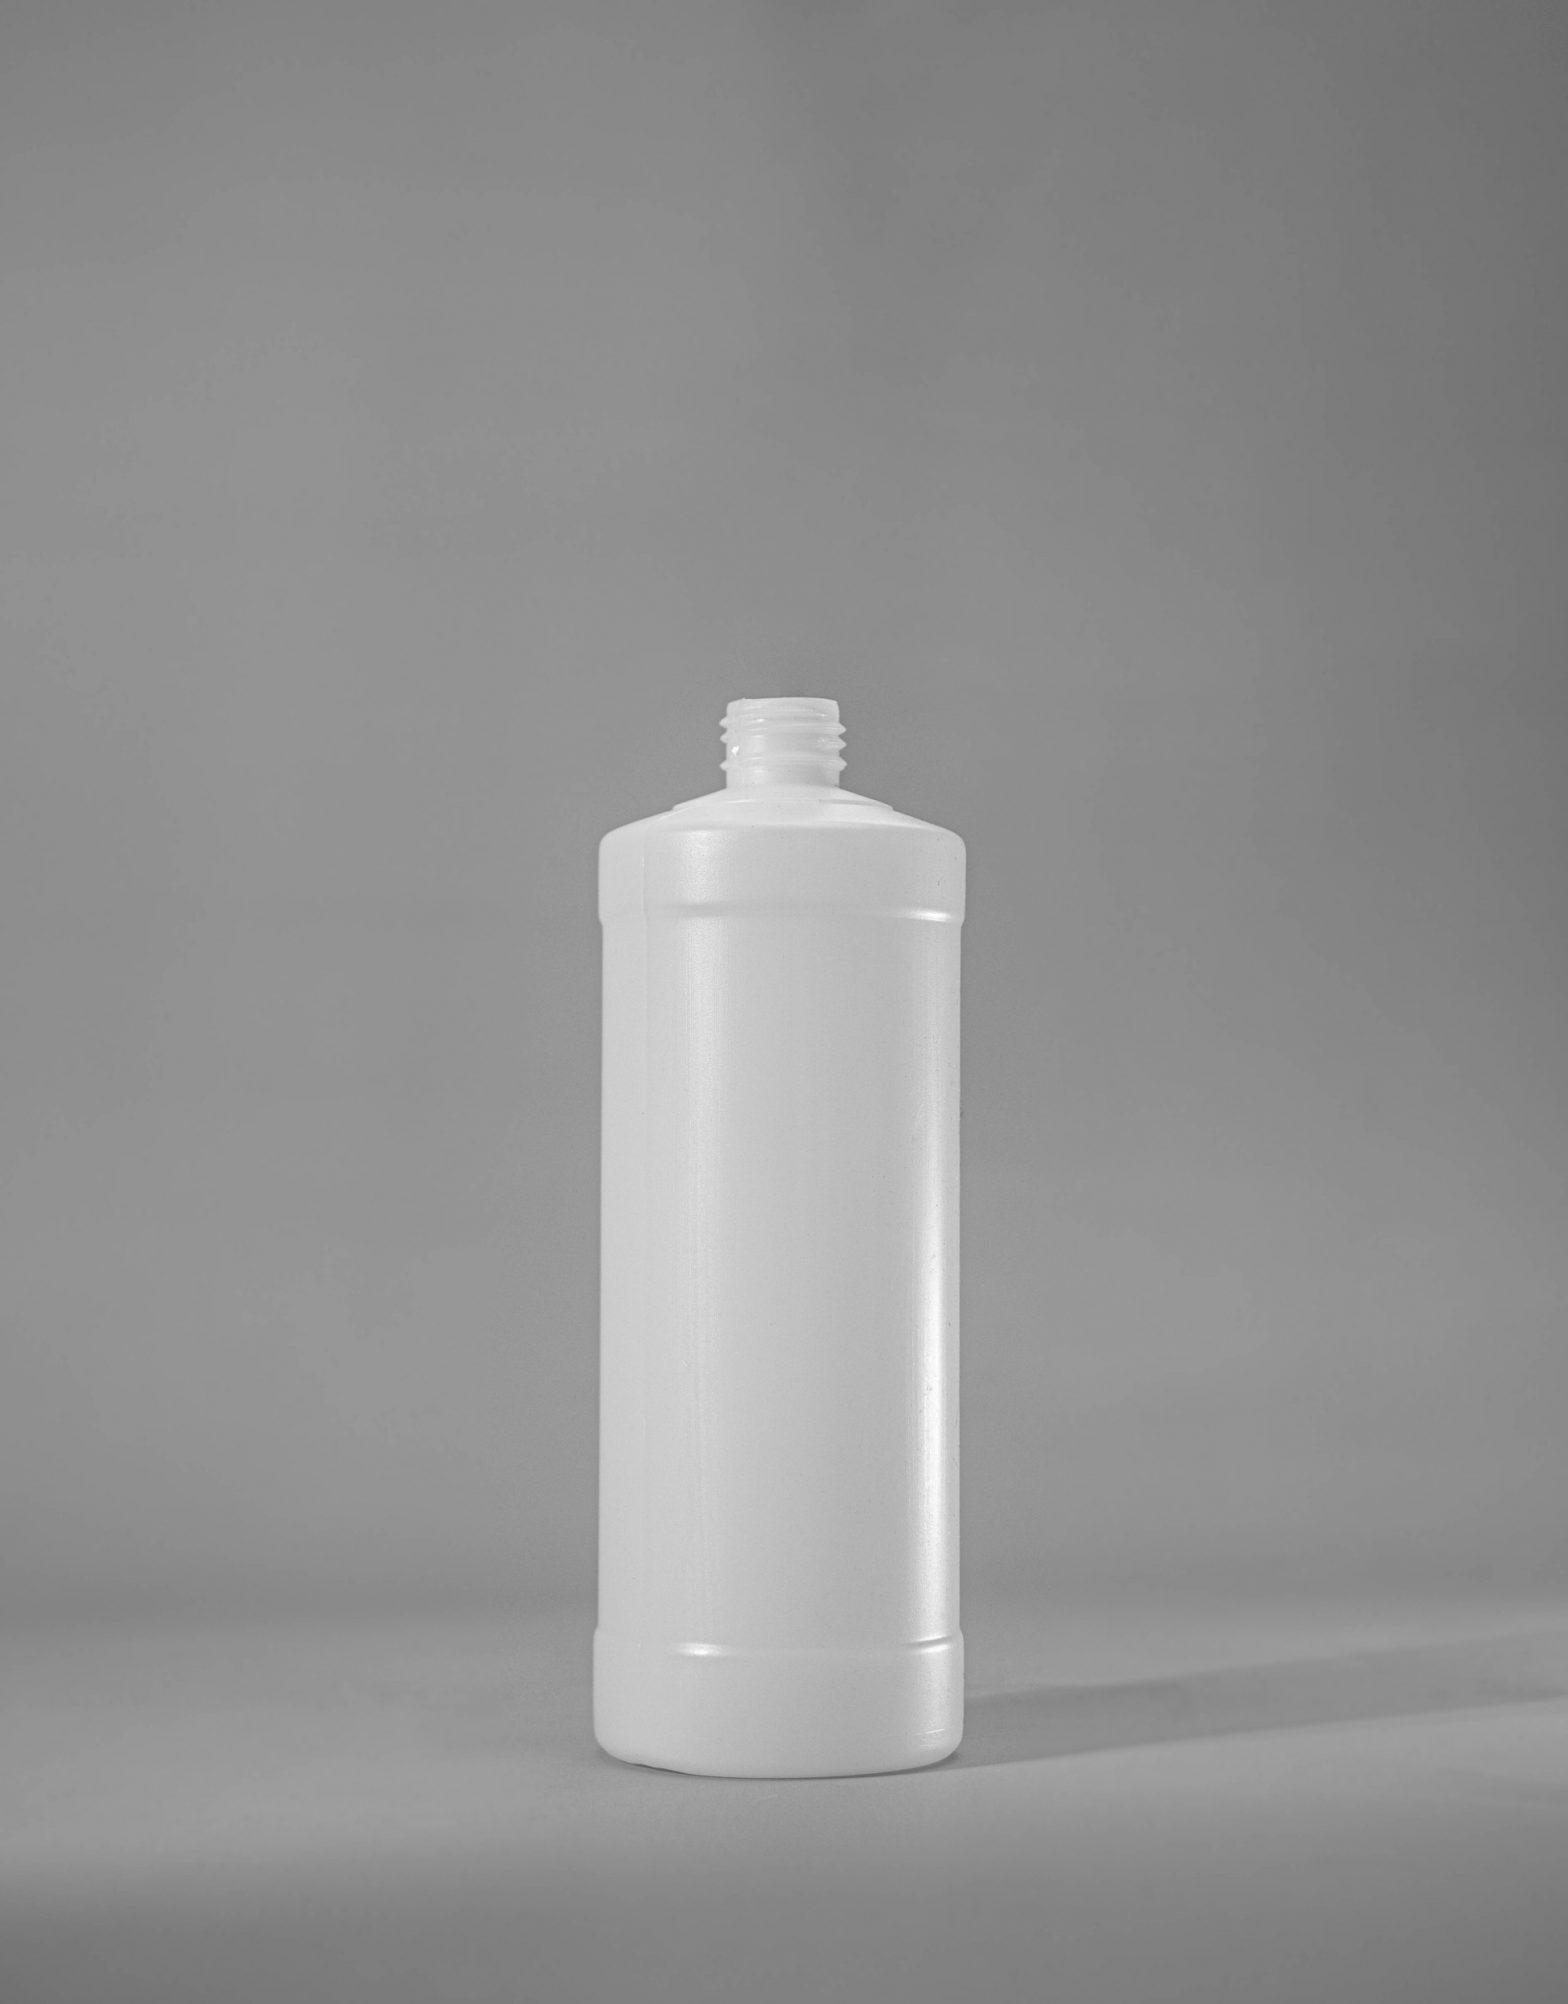 Material HDPE